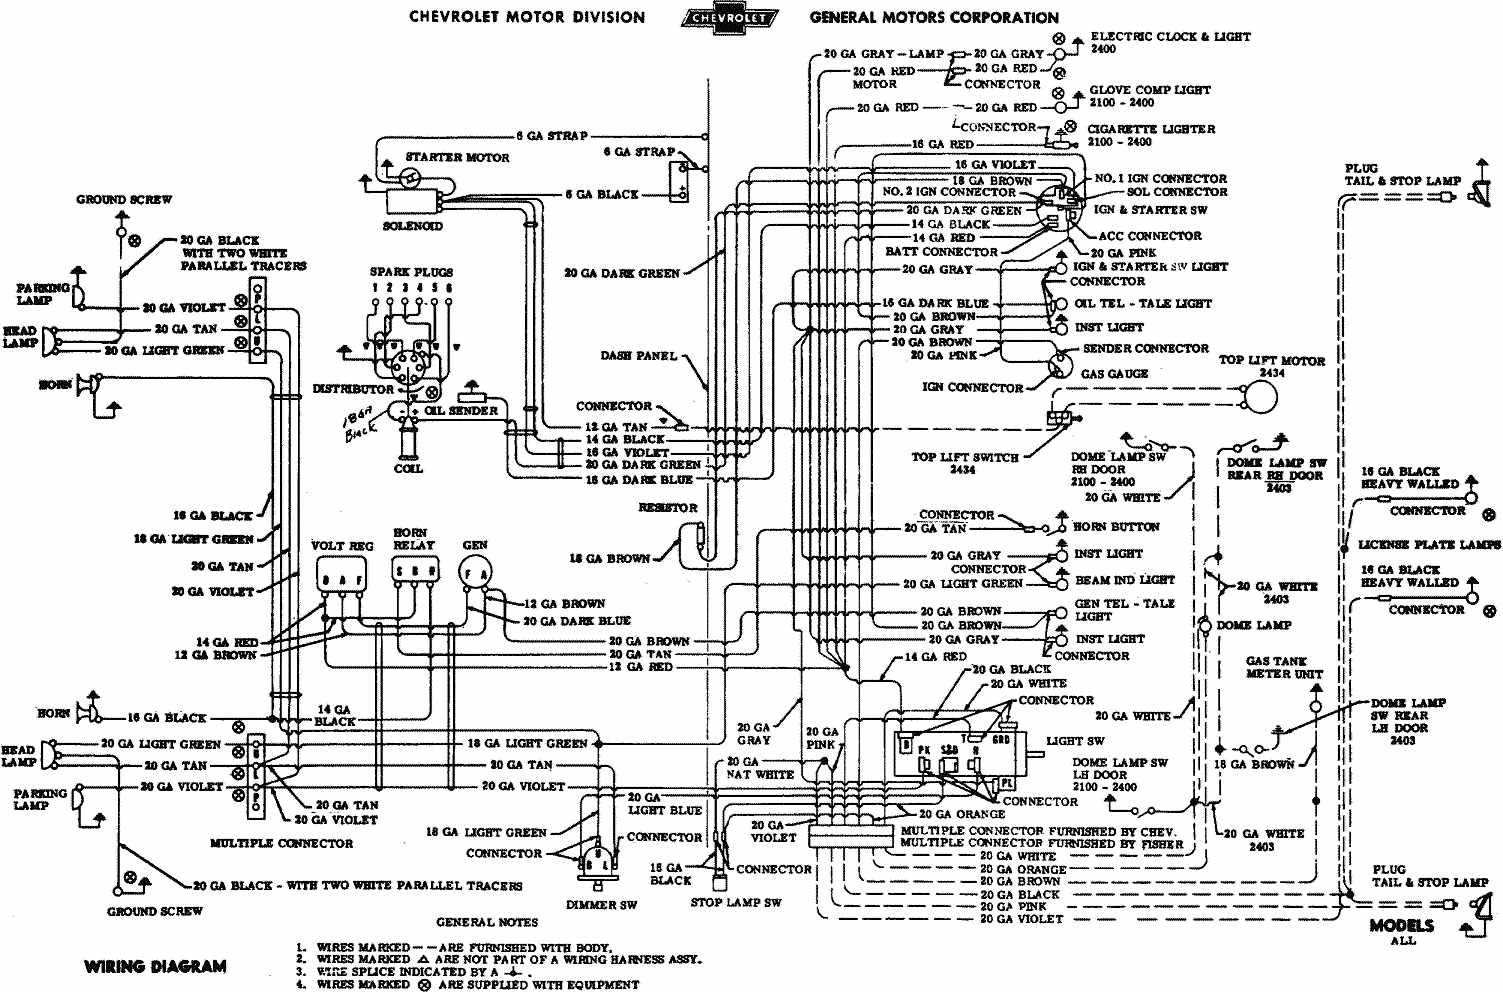 Breathtaking Wiring Diagram For Gauges 1950 Chevy Passenger Car